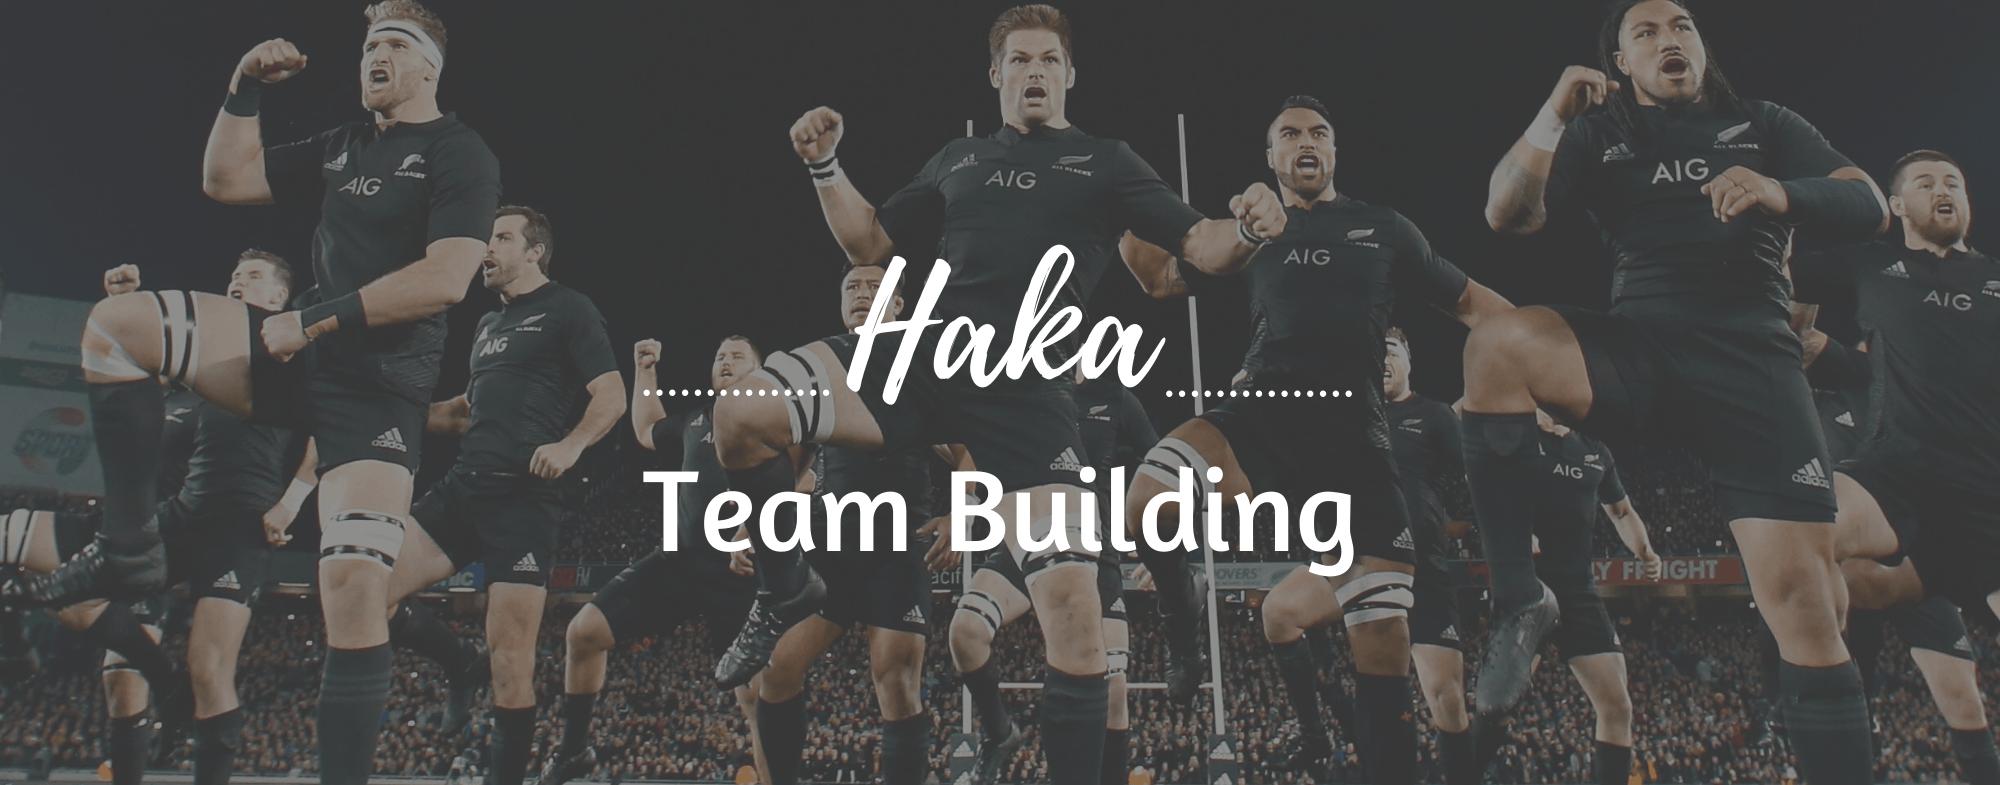 haka-team-building